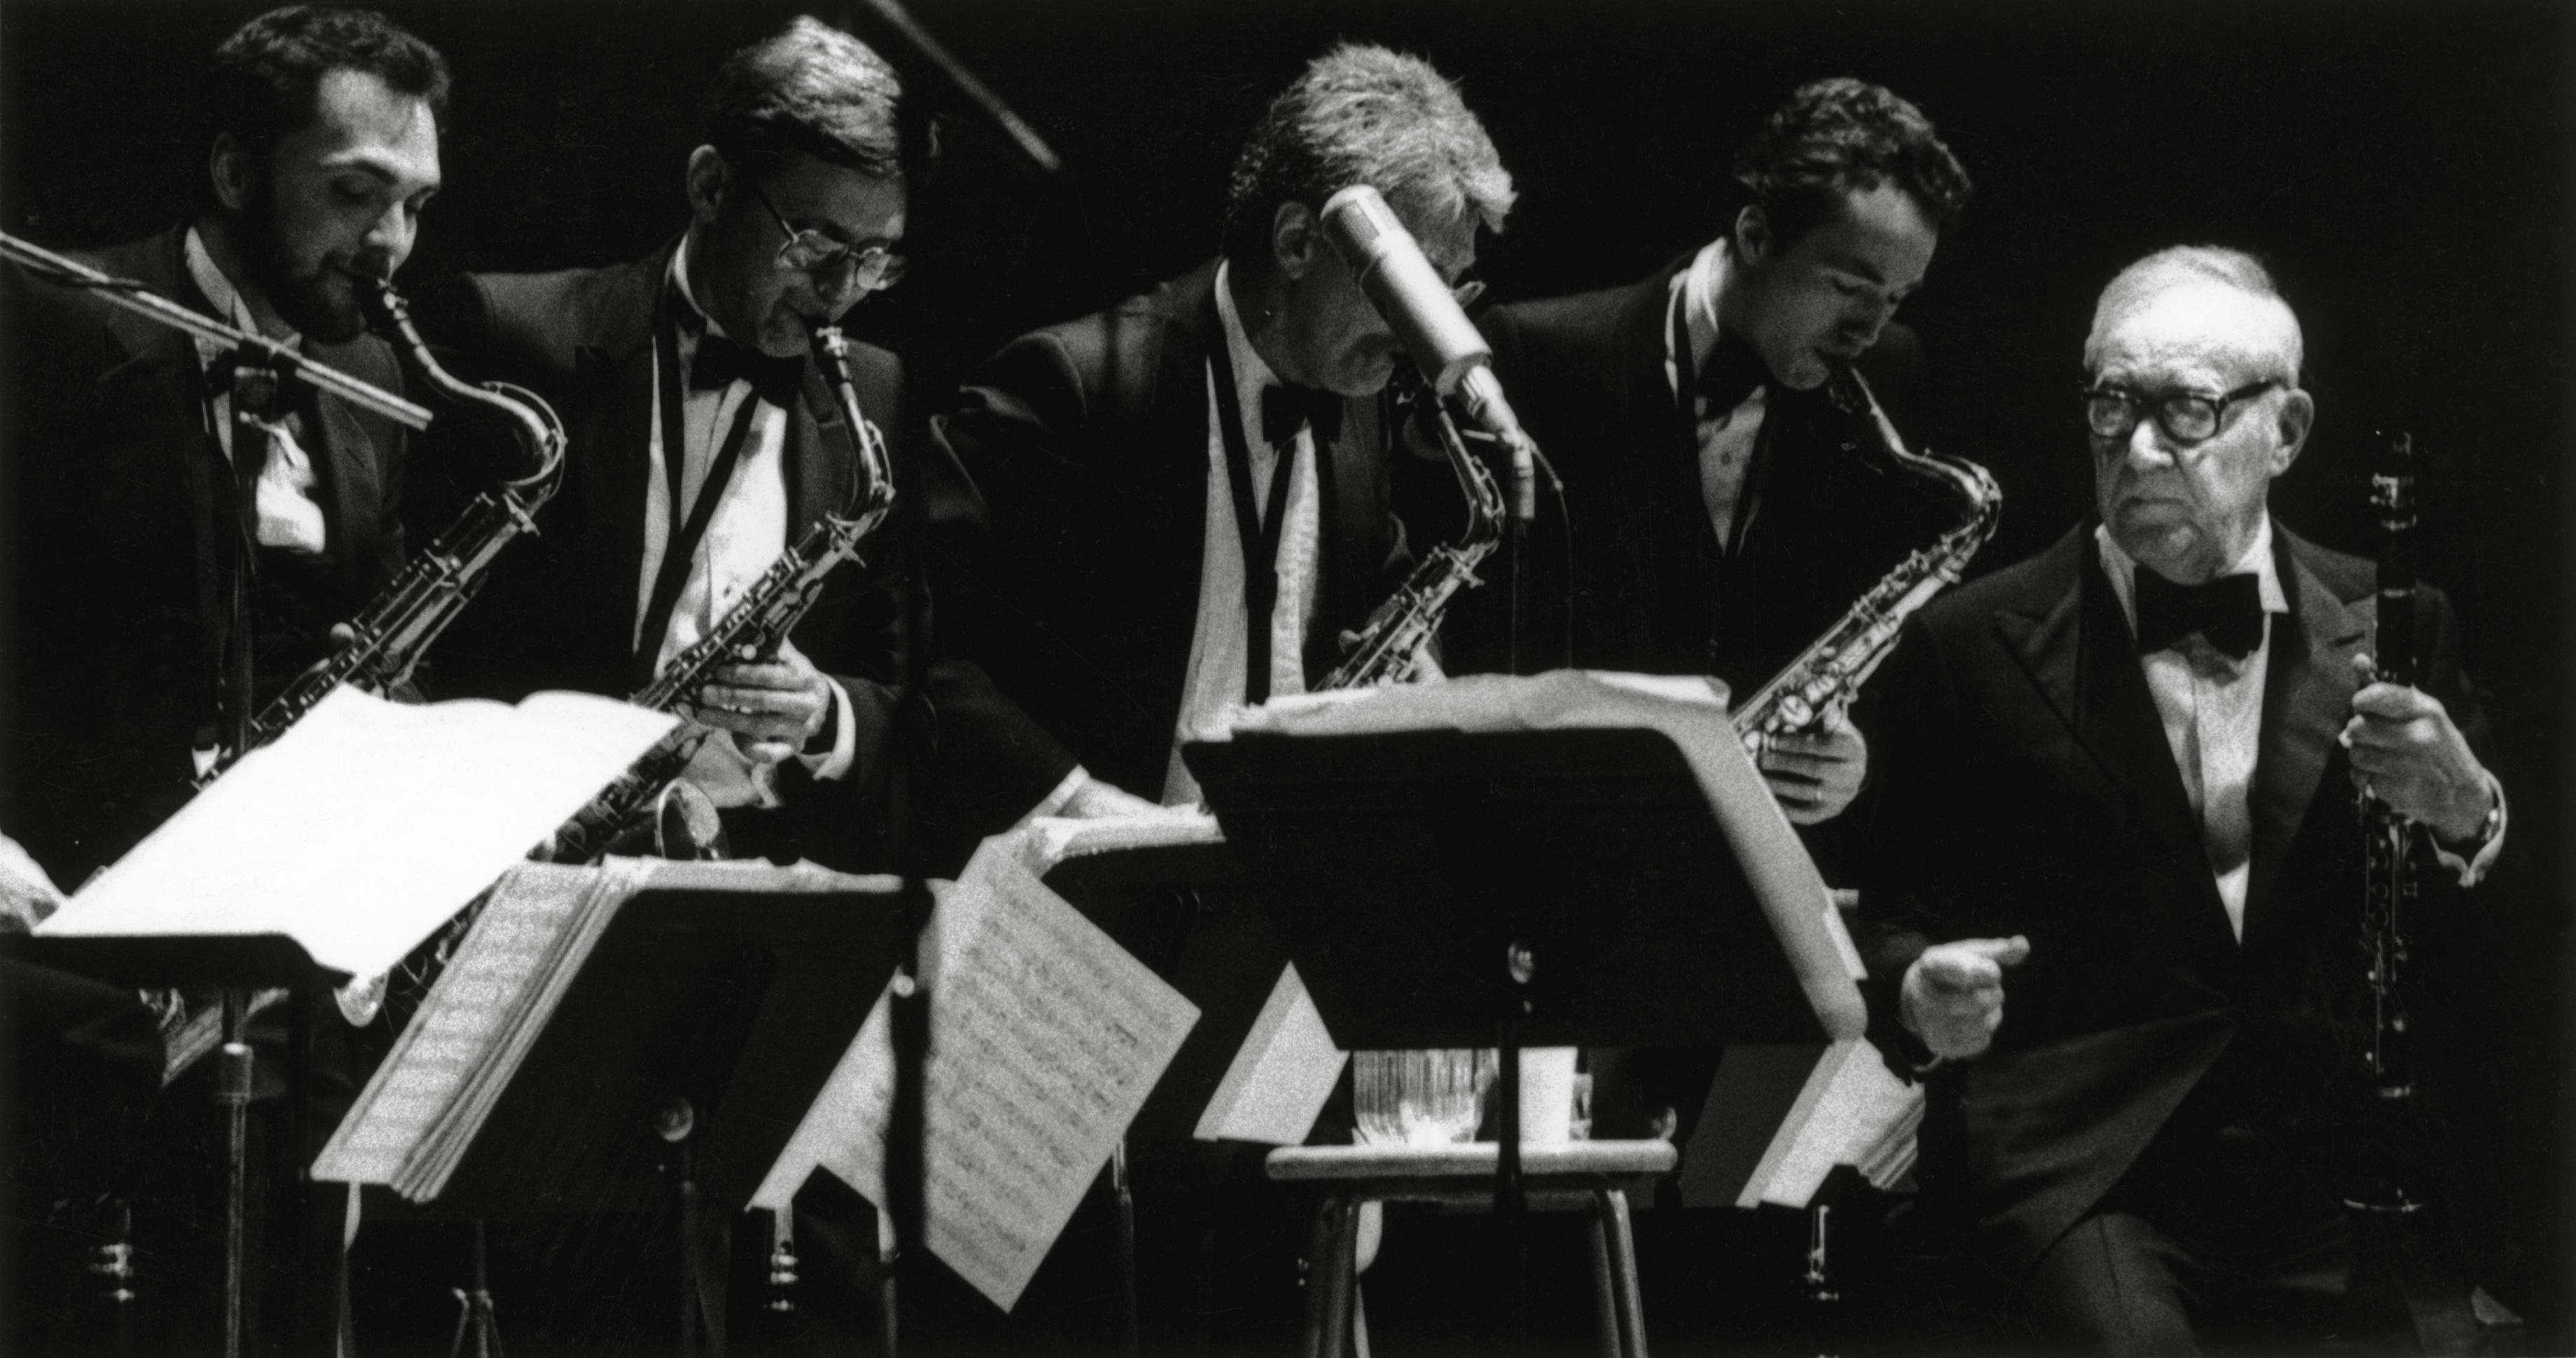 Benny Goodman and his Big Band, March 22, 1986